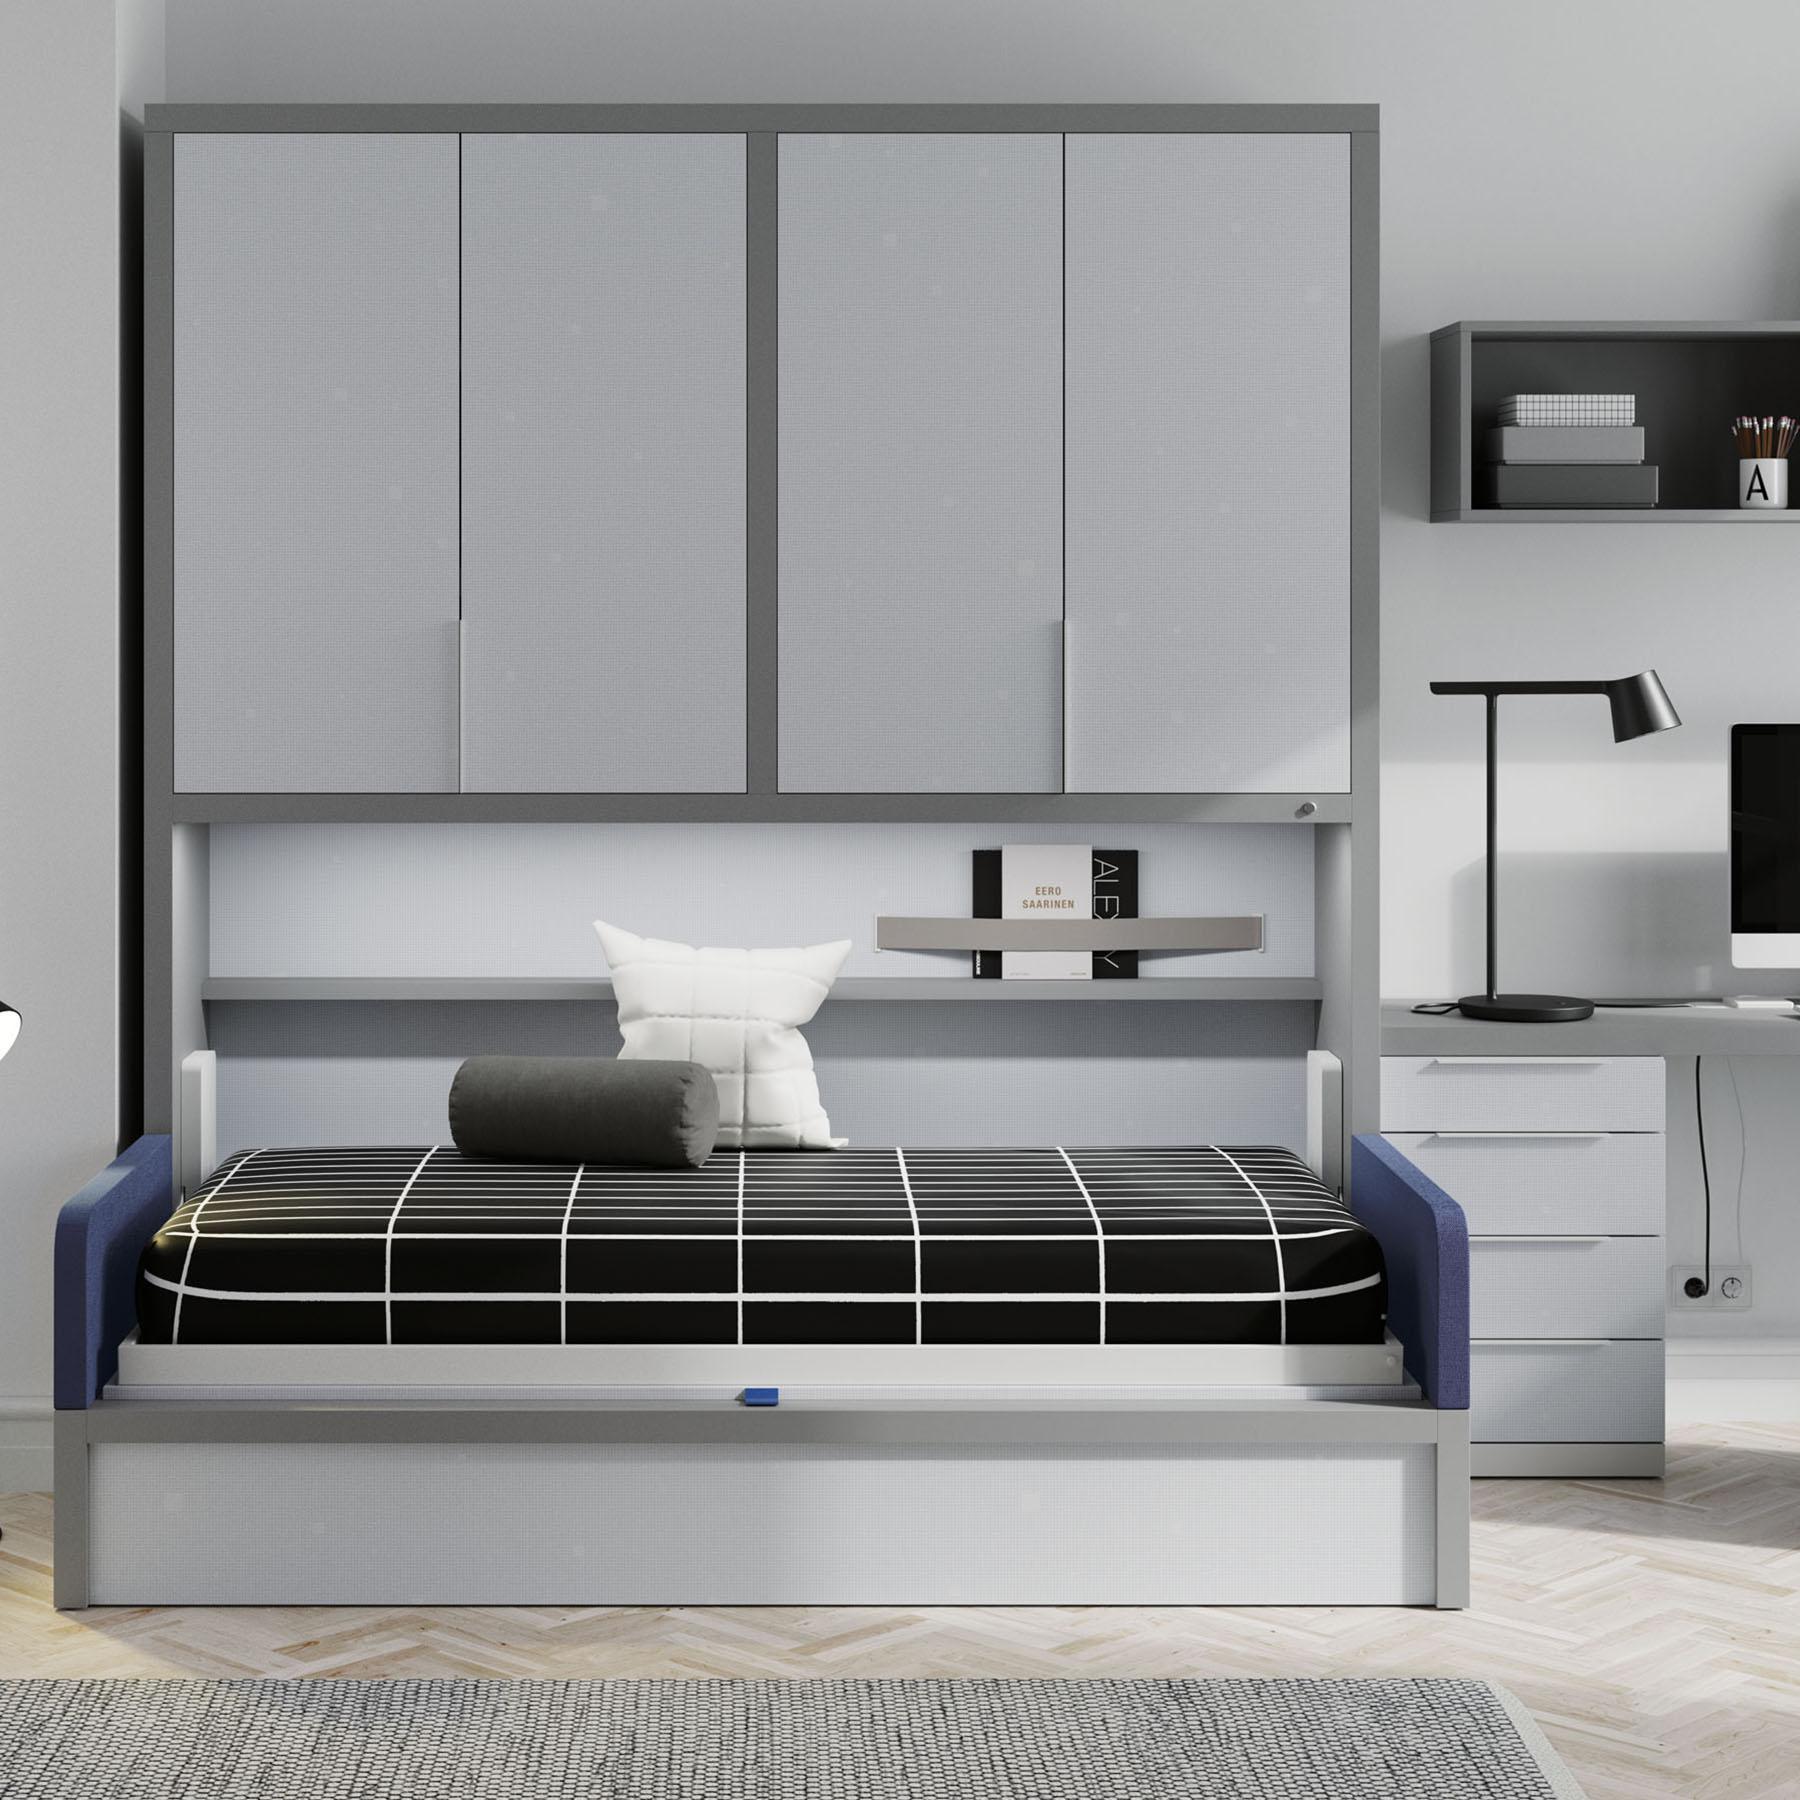 Habitaci n juvenil cama abatible 4 mbit - Habitacion juvenil cama abatible ...